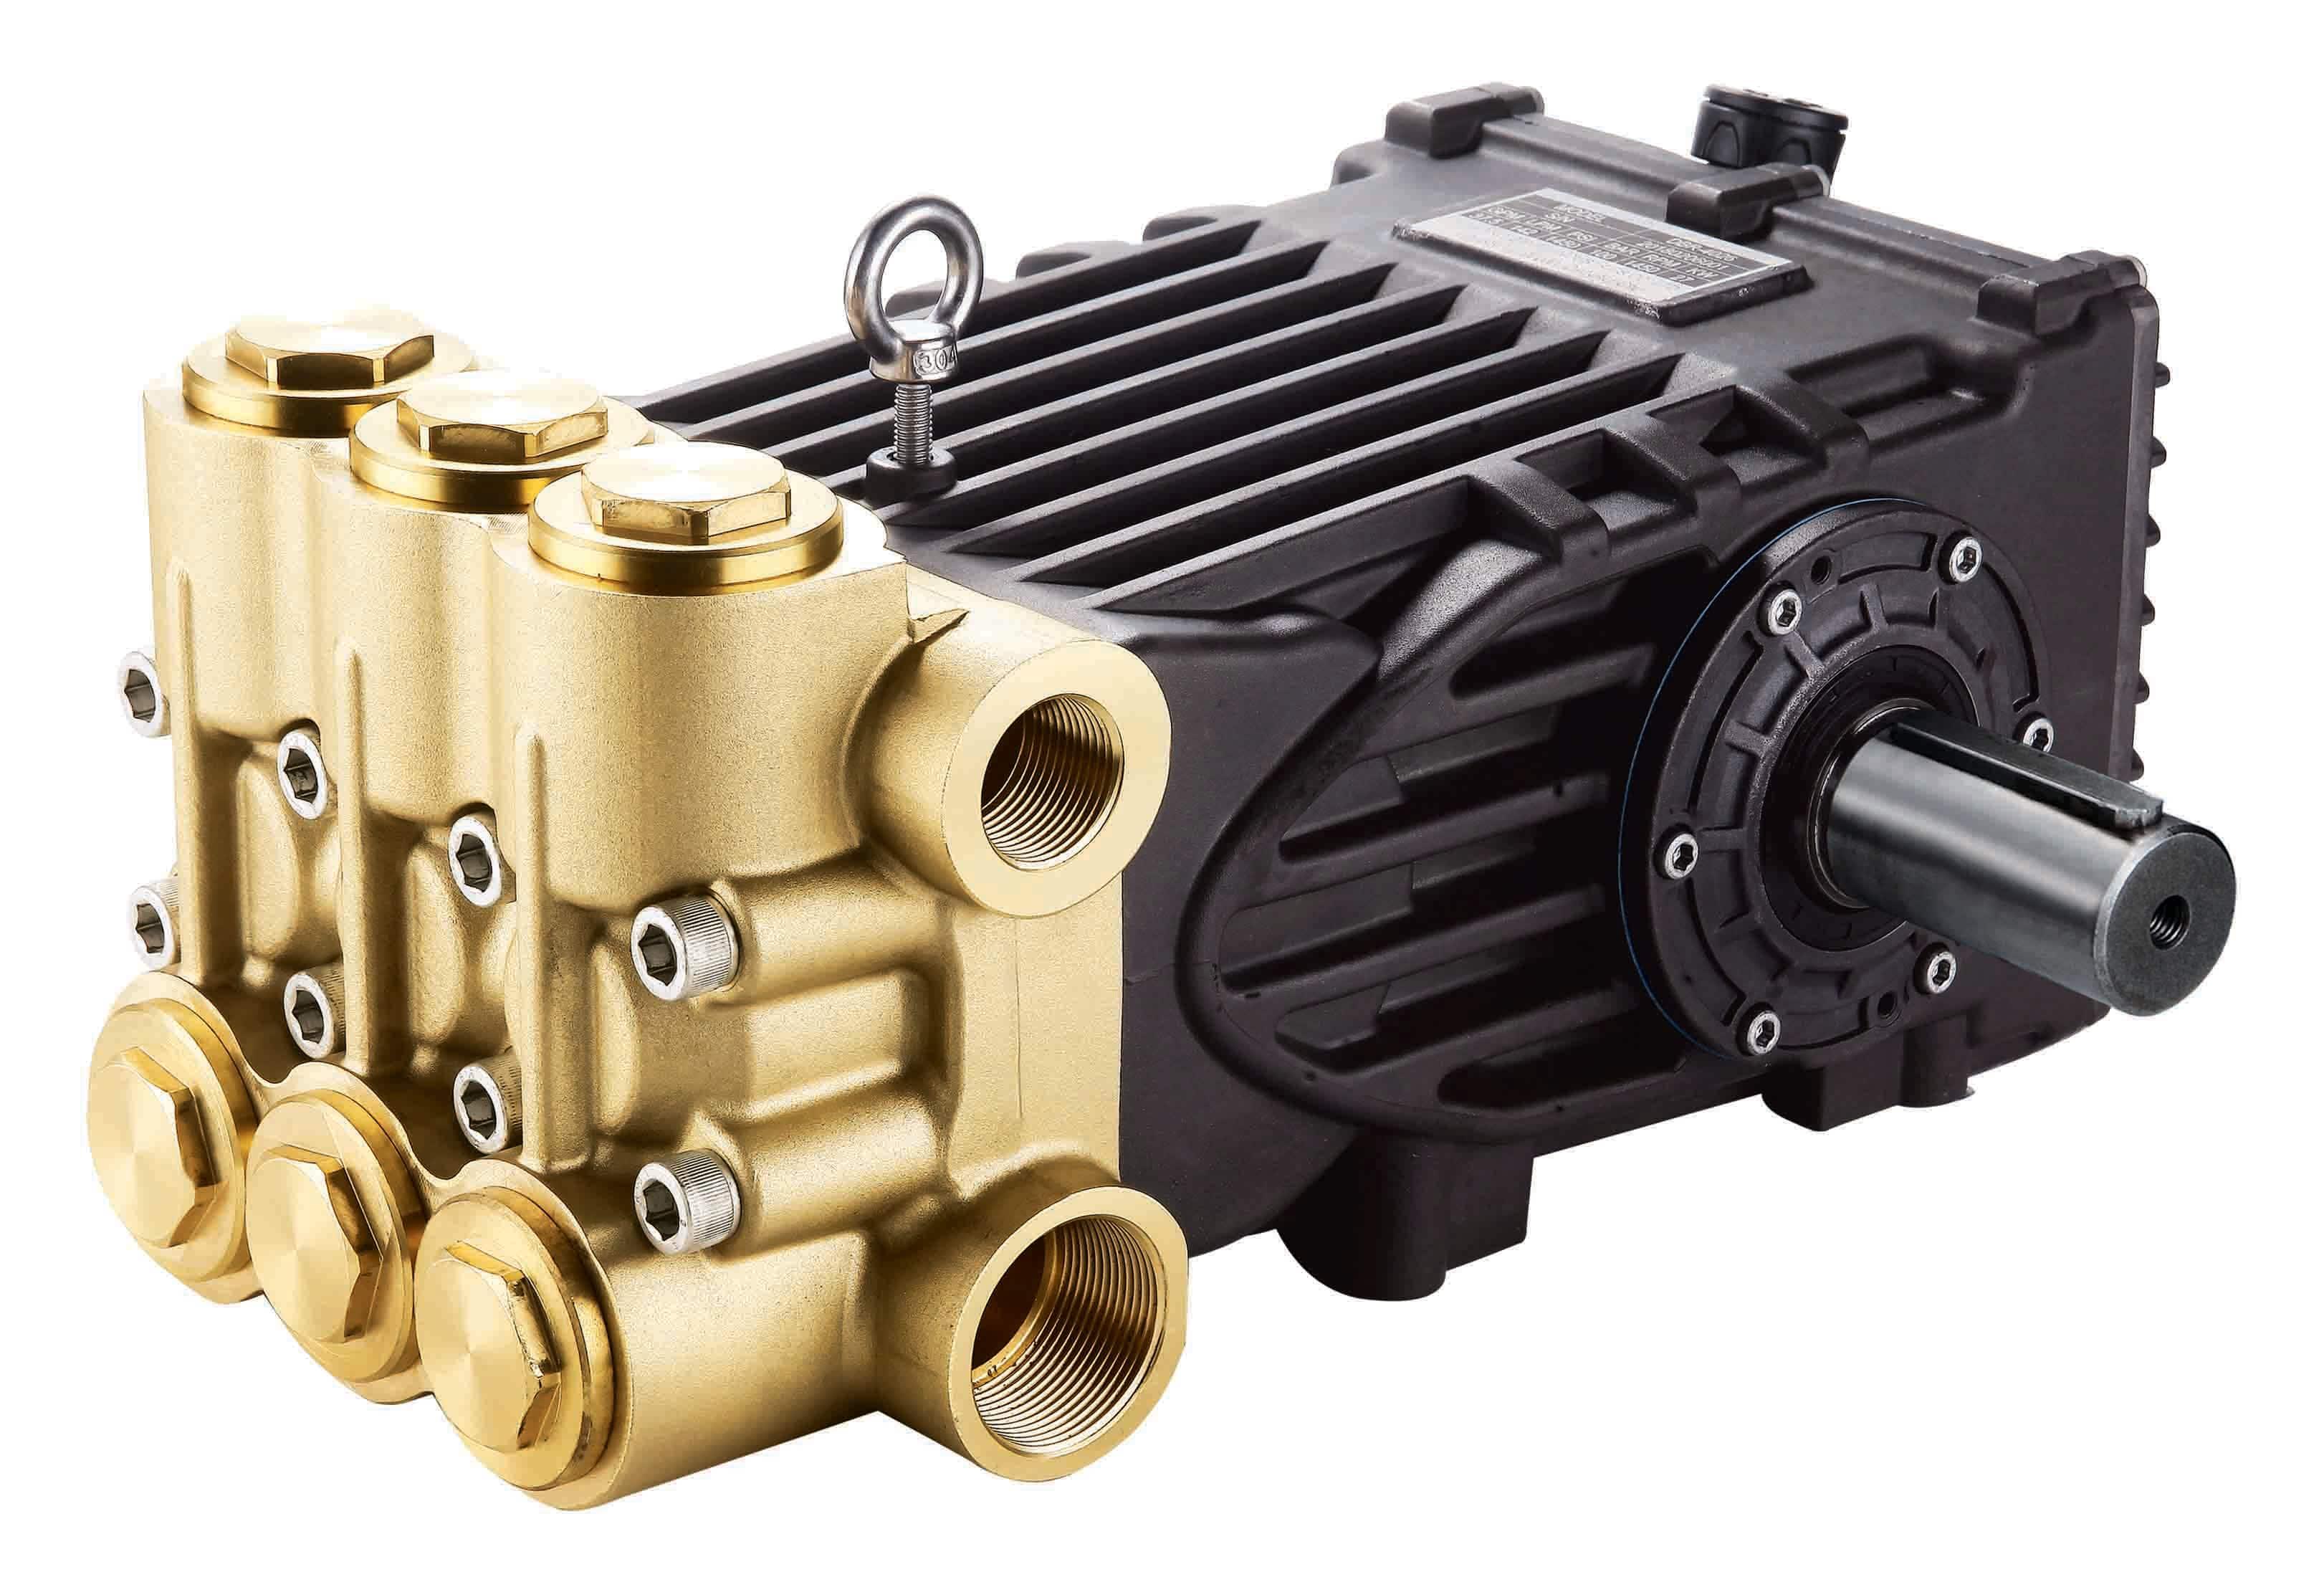 DBR Series Reciprocating High Pressure Plunger Pump